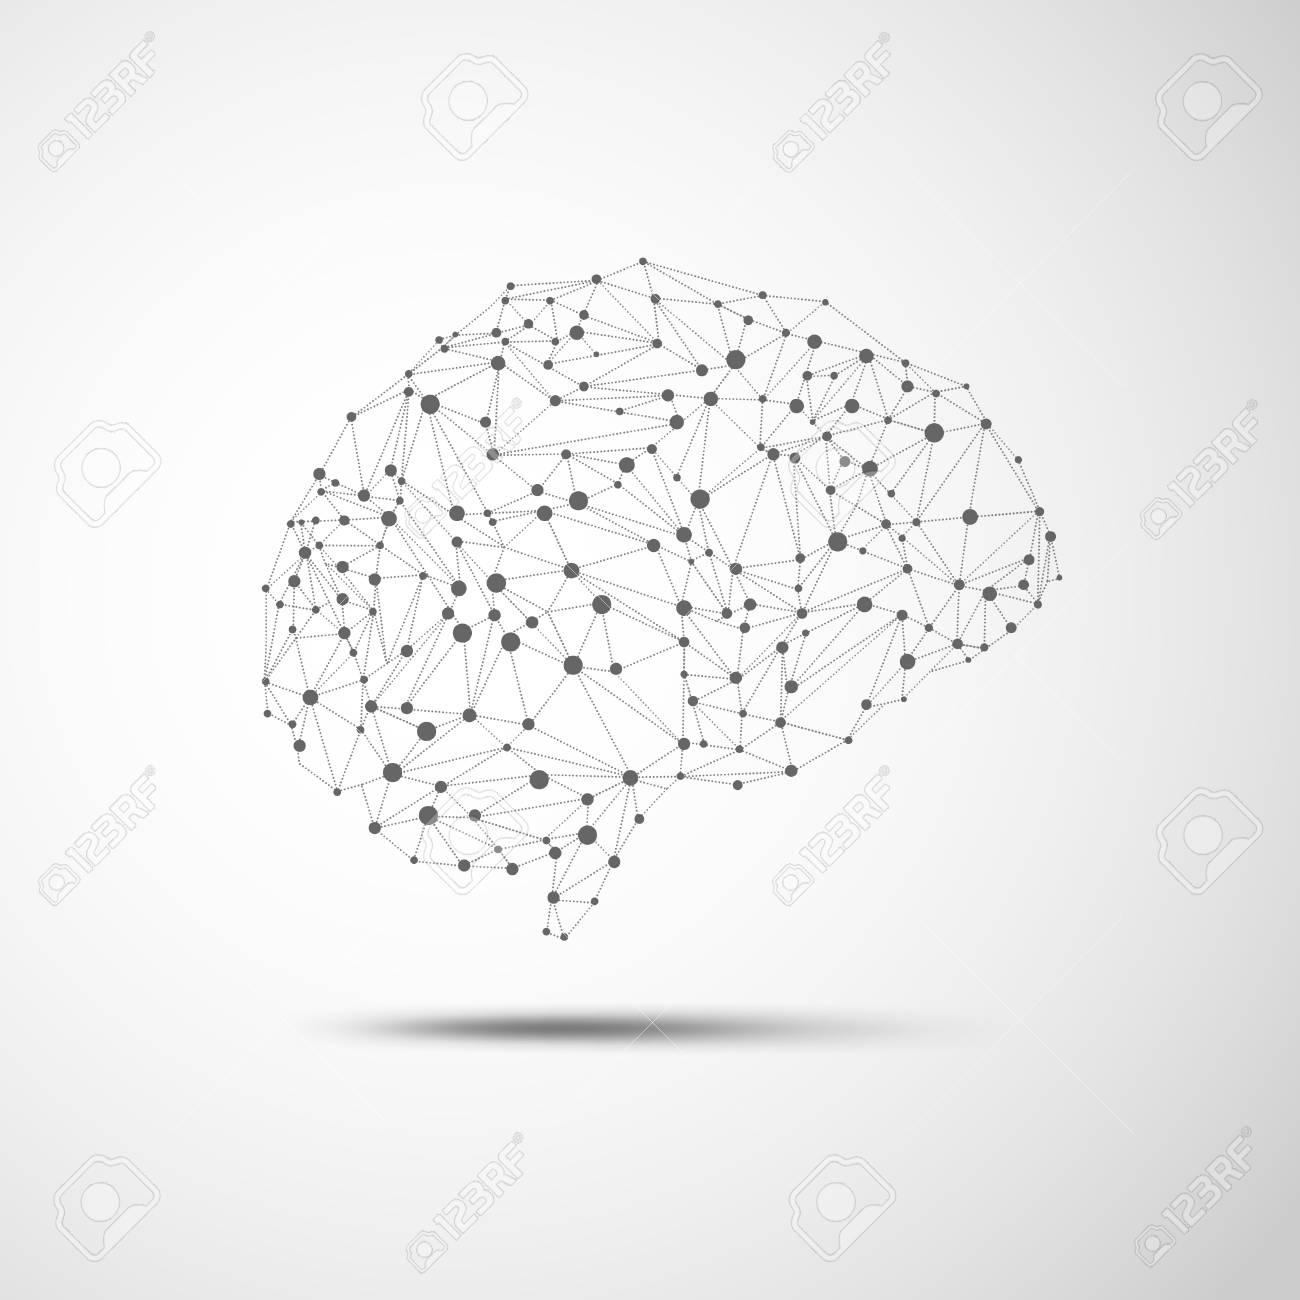 wireframe brain in scientific theme - 84038903